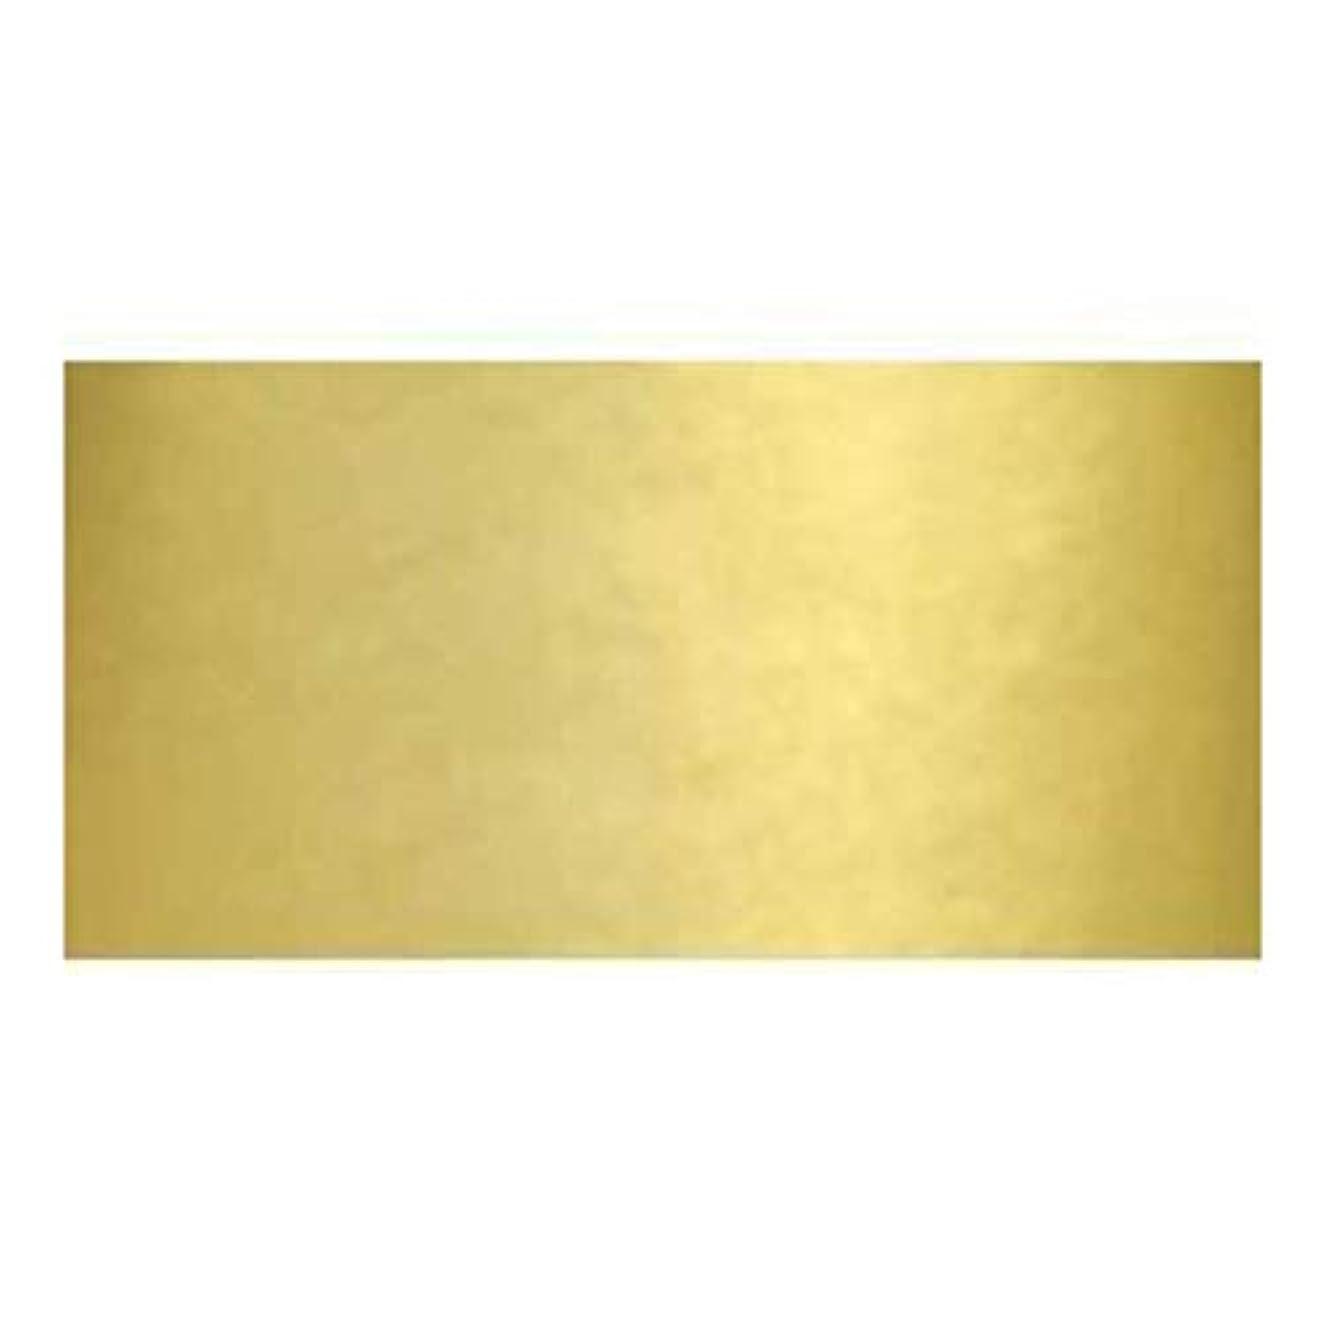 Viva Decor Inka Gold Paint, 62.5gm, Champagne